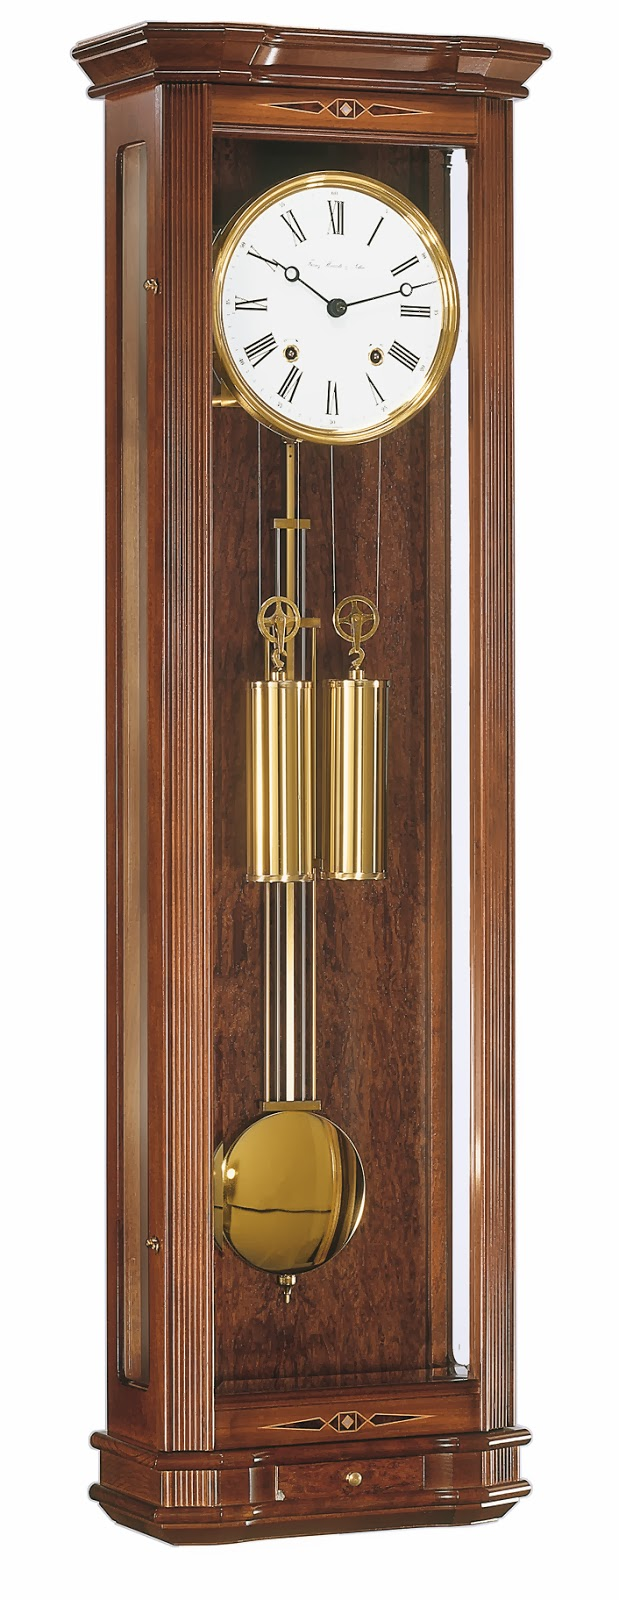 Hermle Clapham Mechanical Wall Clock